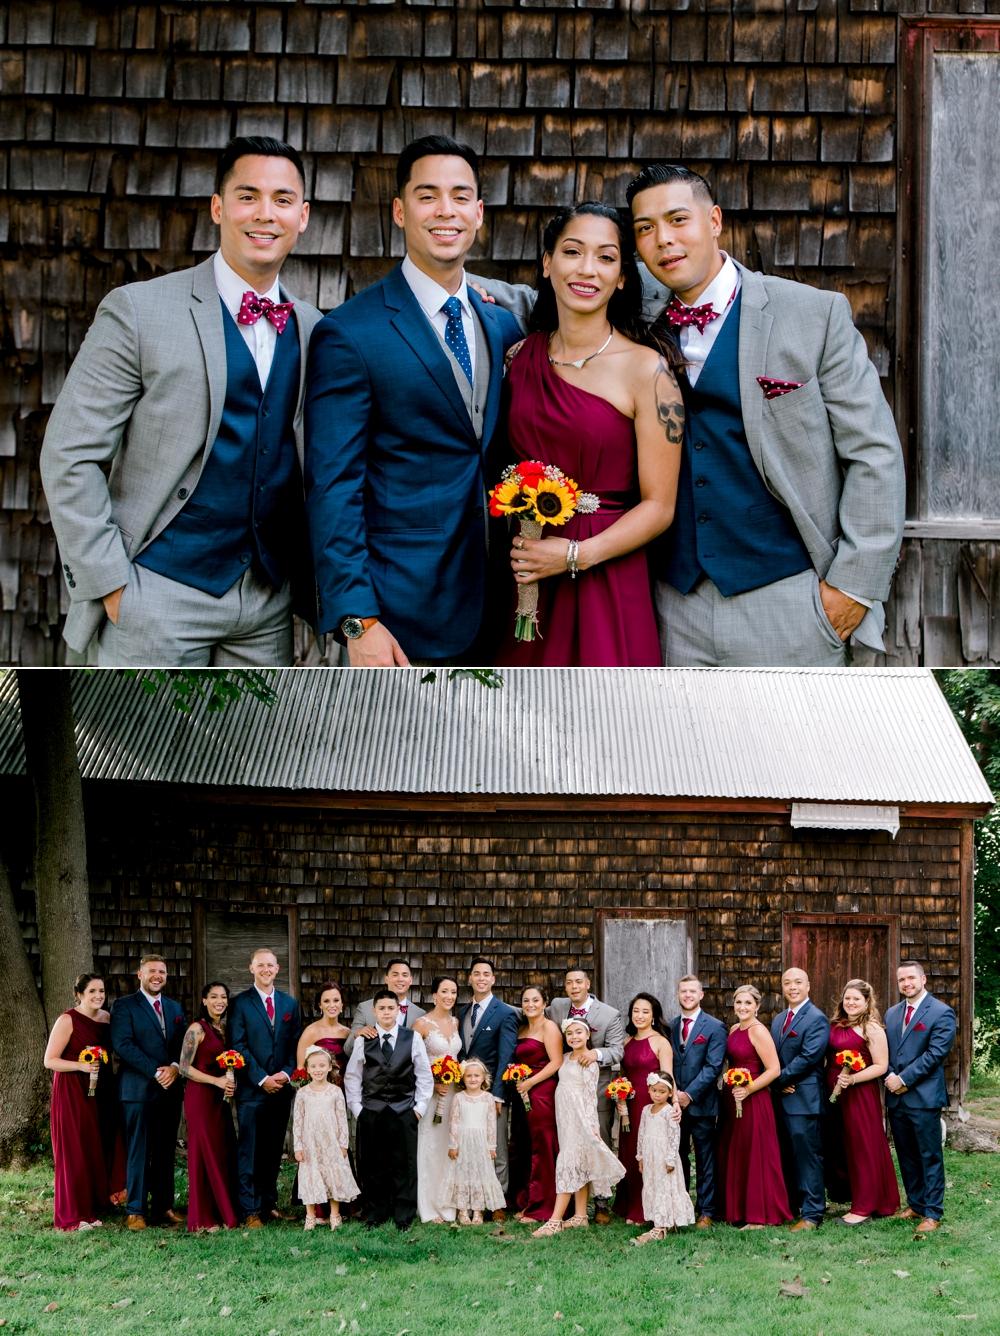 SomerbyJonesPhotography__SmithBarnWedding_SmithBarn_WeddingatSmithBarn_0021.jpg